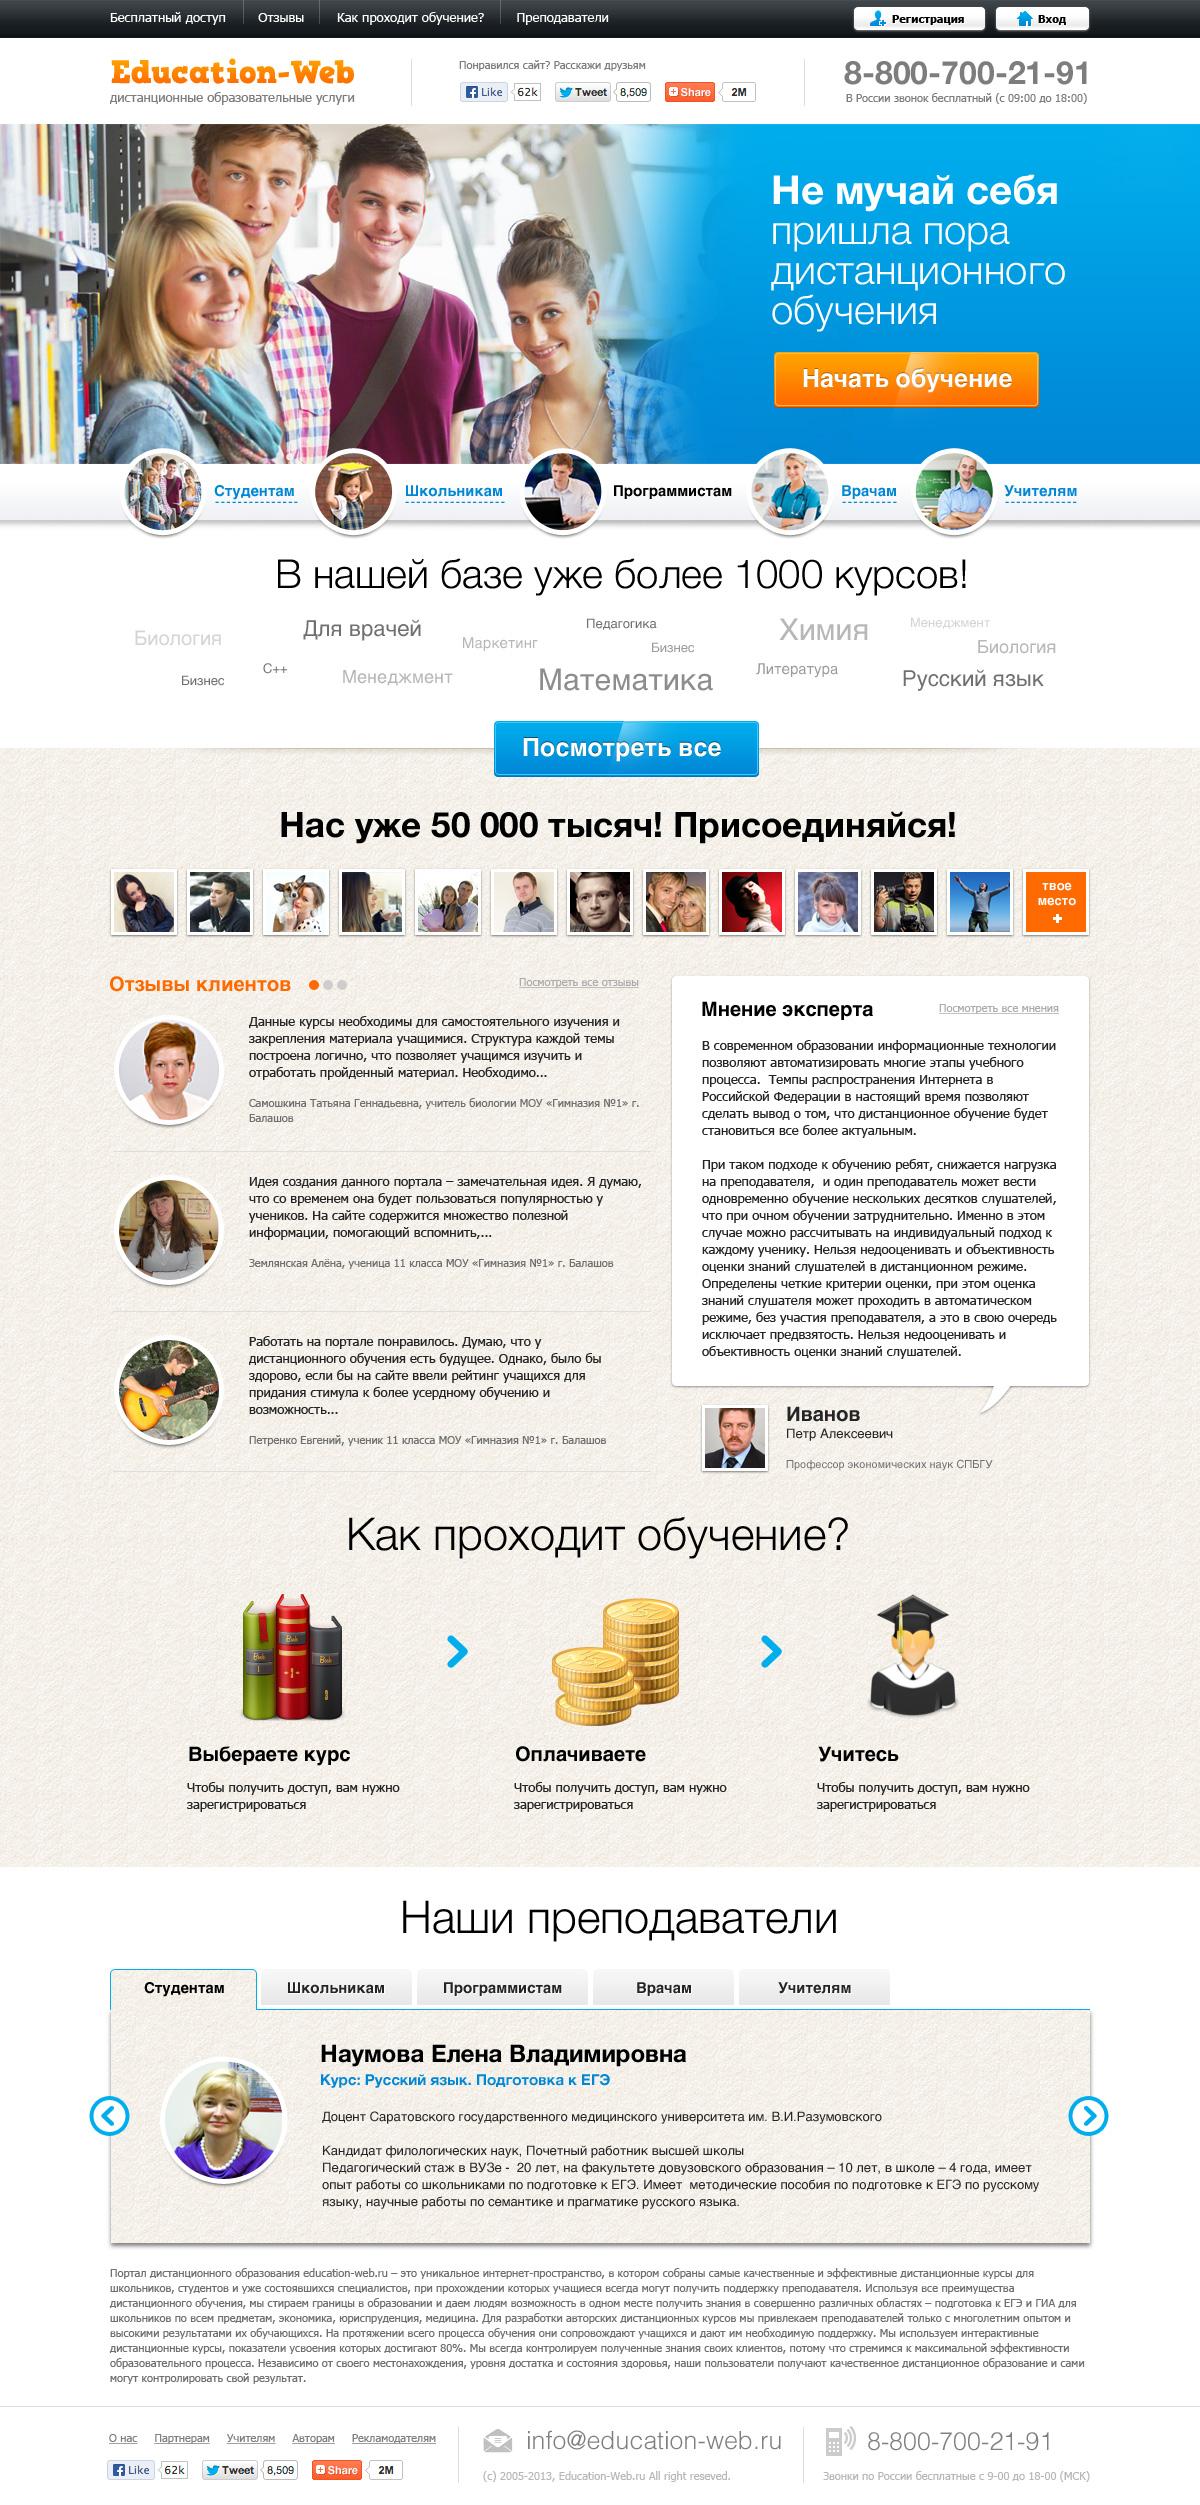 Education-web.ru - online образование